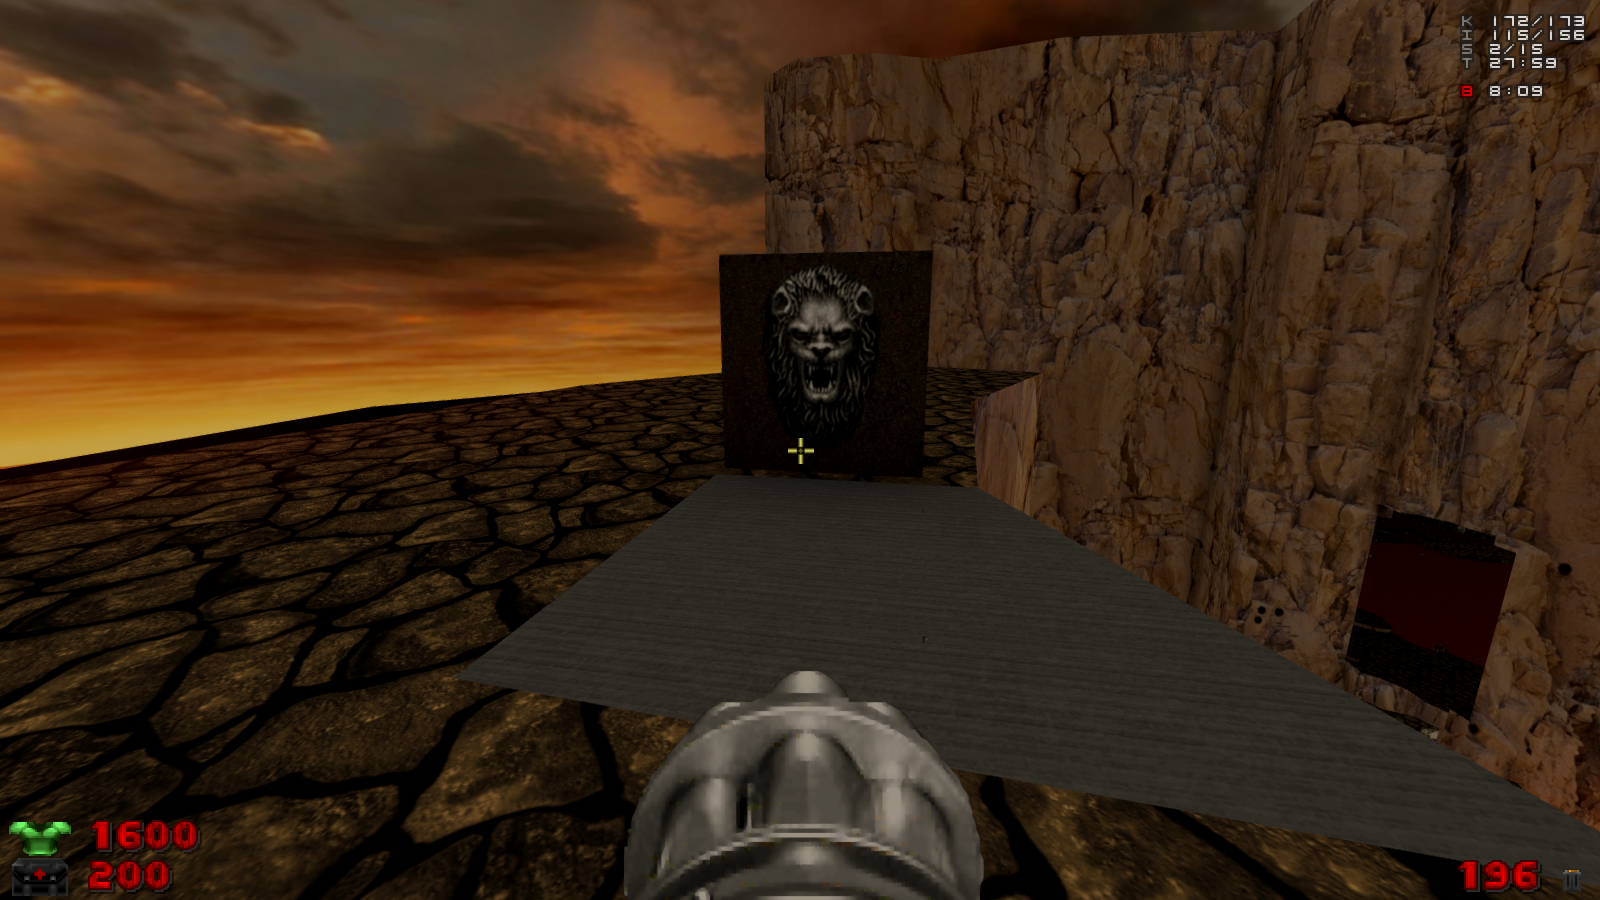 Screenshot_Doom_20180720_225743.png.4a68ee7b166d797548d53bffc5c31410.png